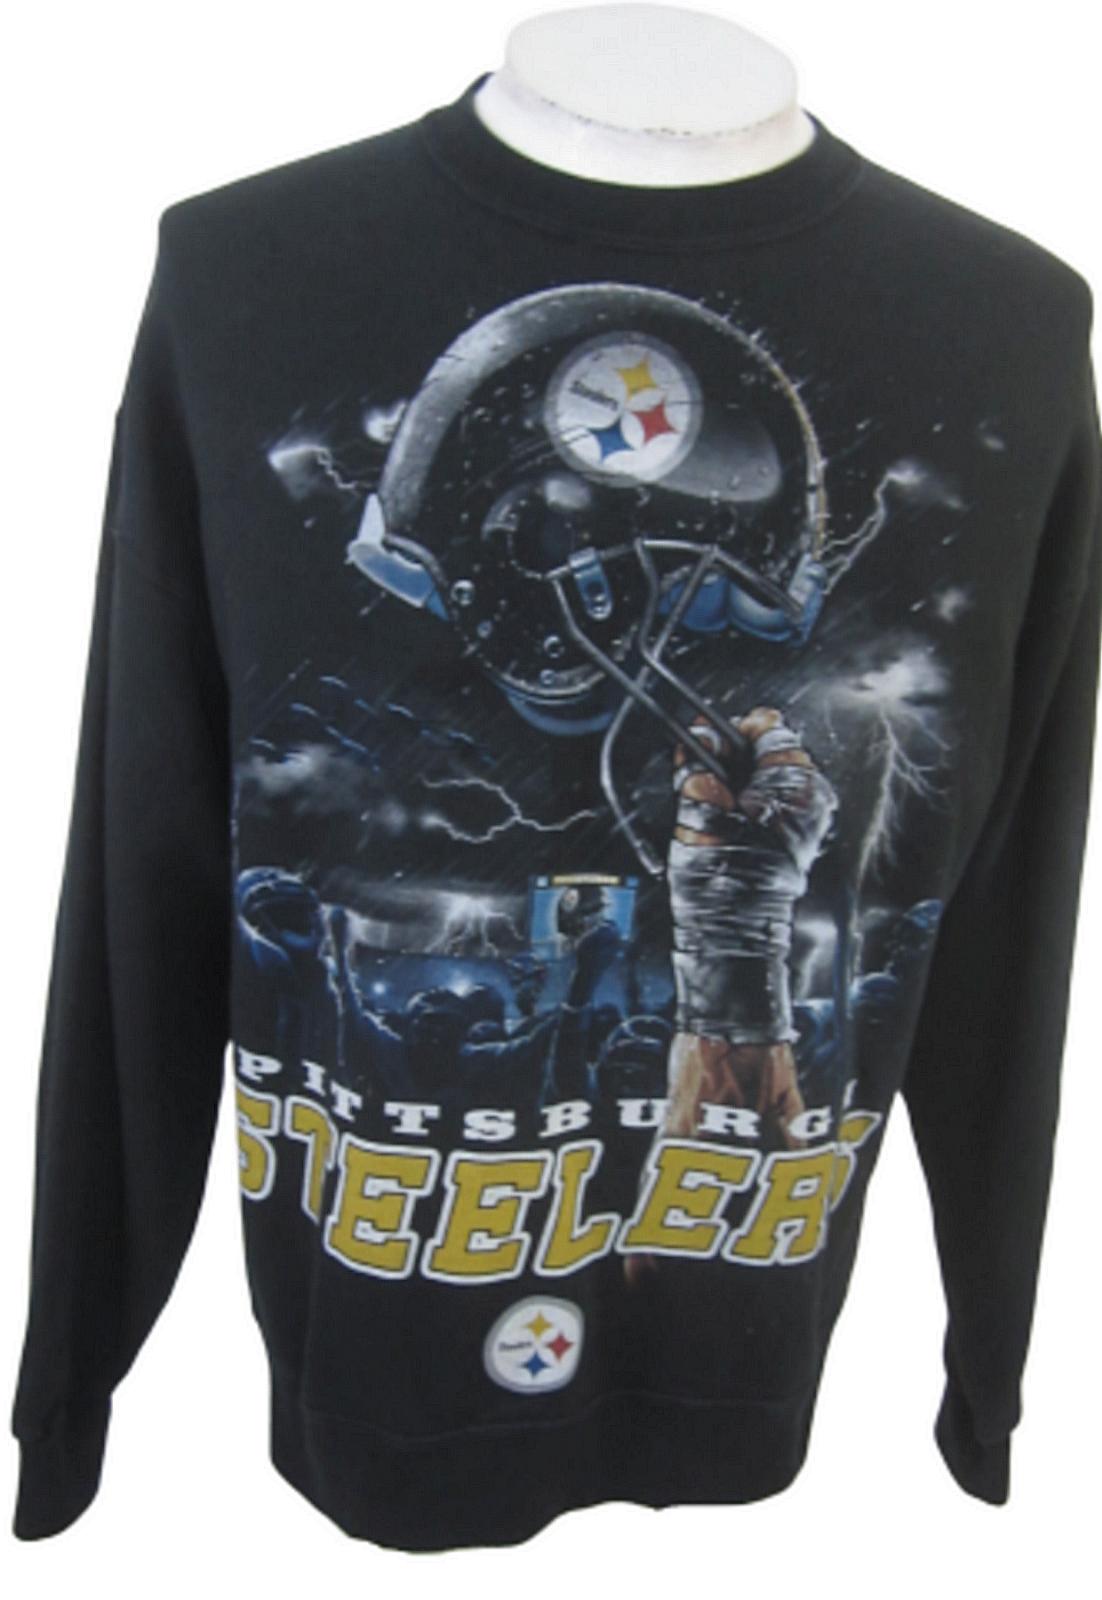 Pittsburg Steelers Sweatshirt NFL Team Apparel L black Jerzees - $17.24